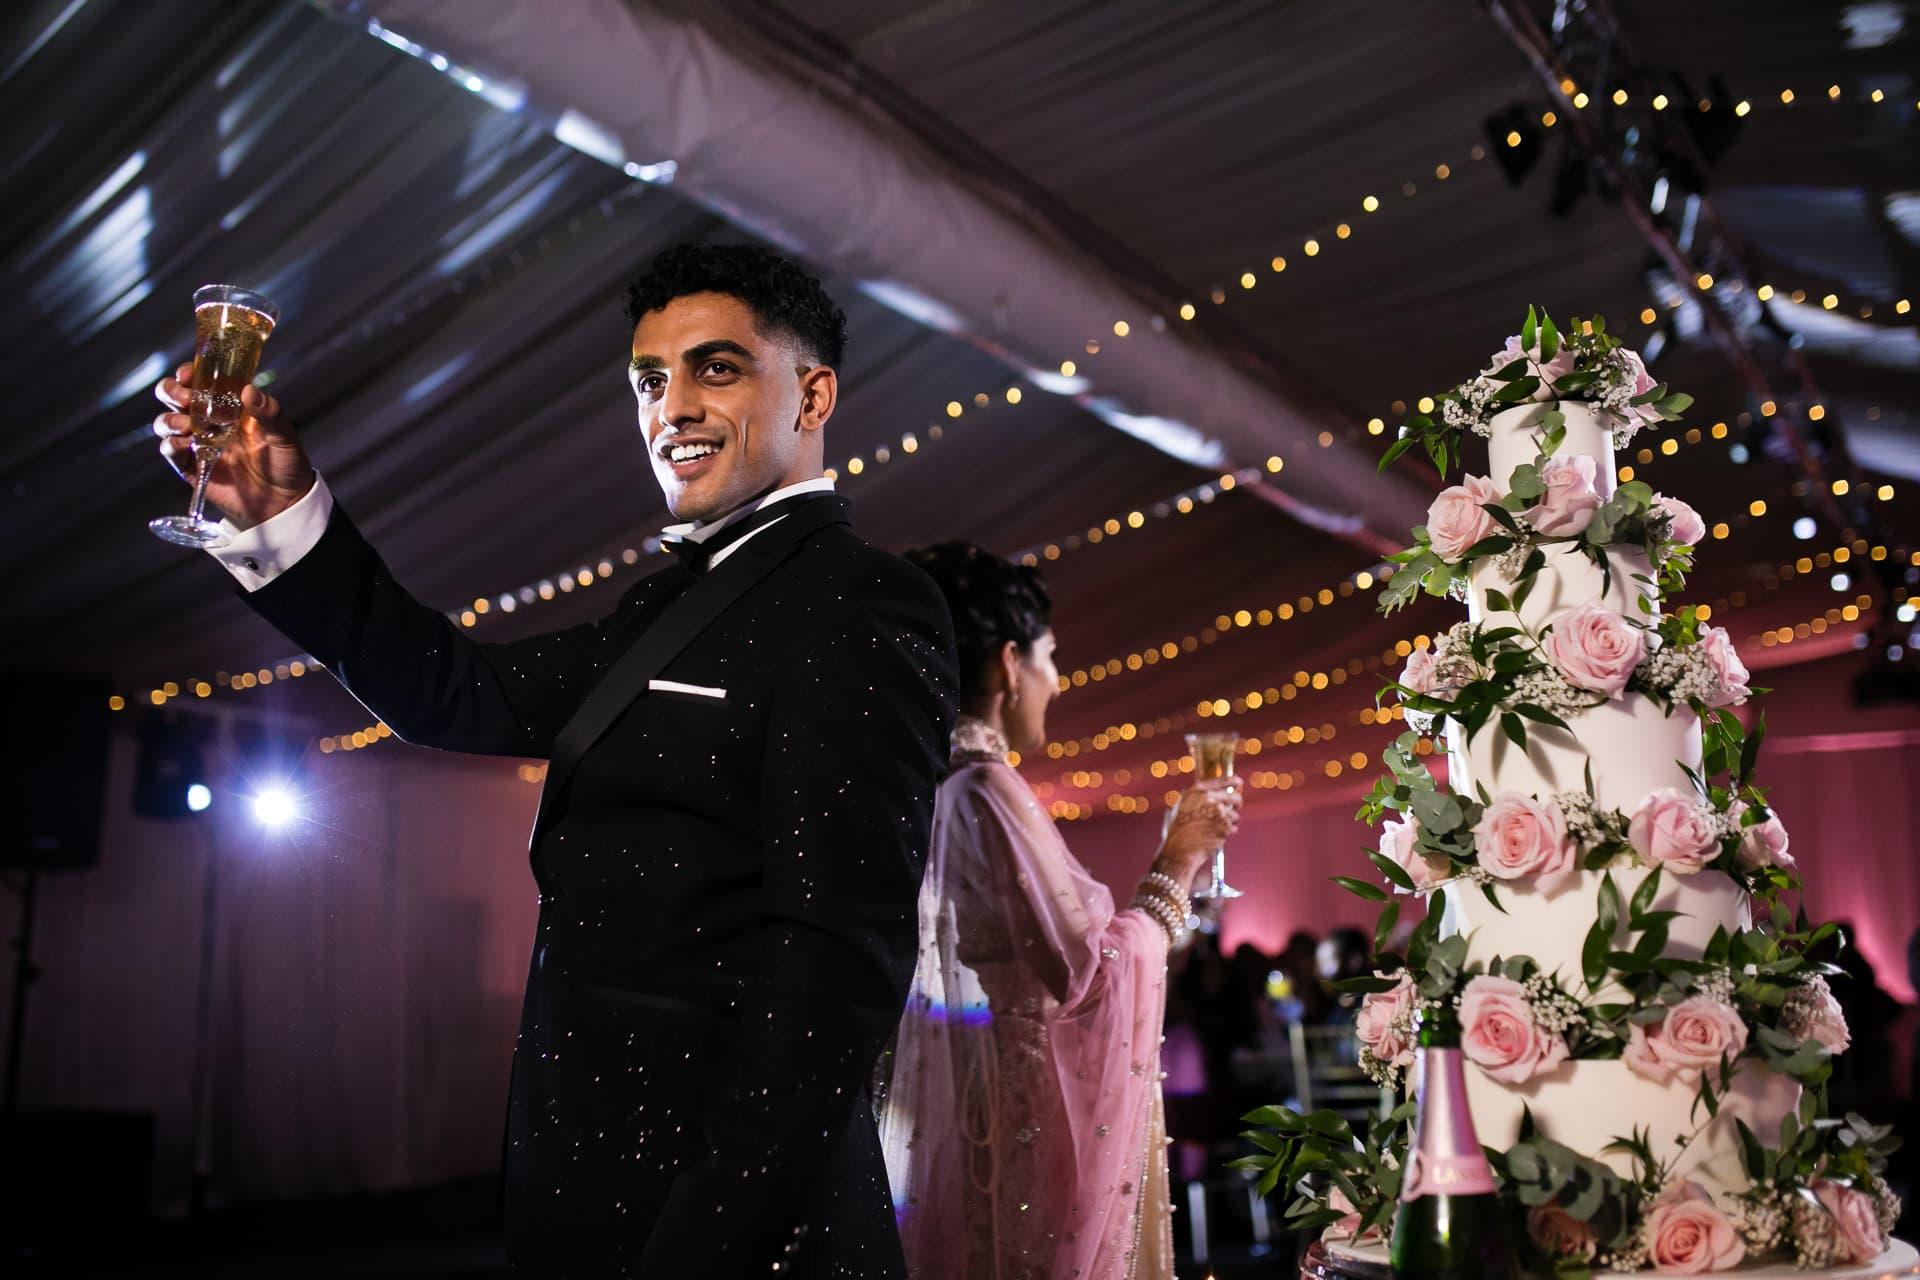 Groom toasting wedding guests